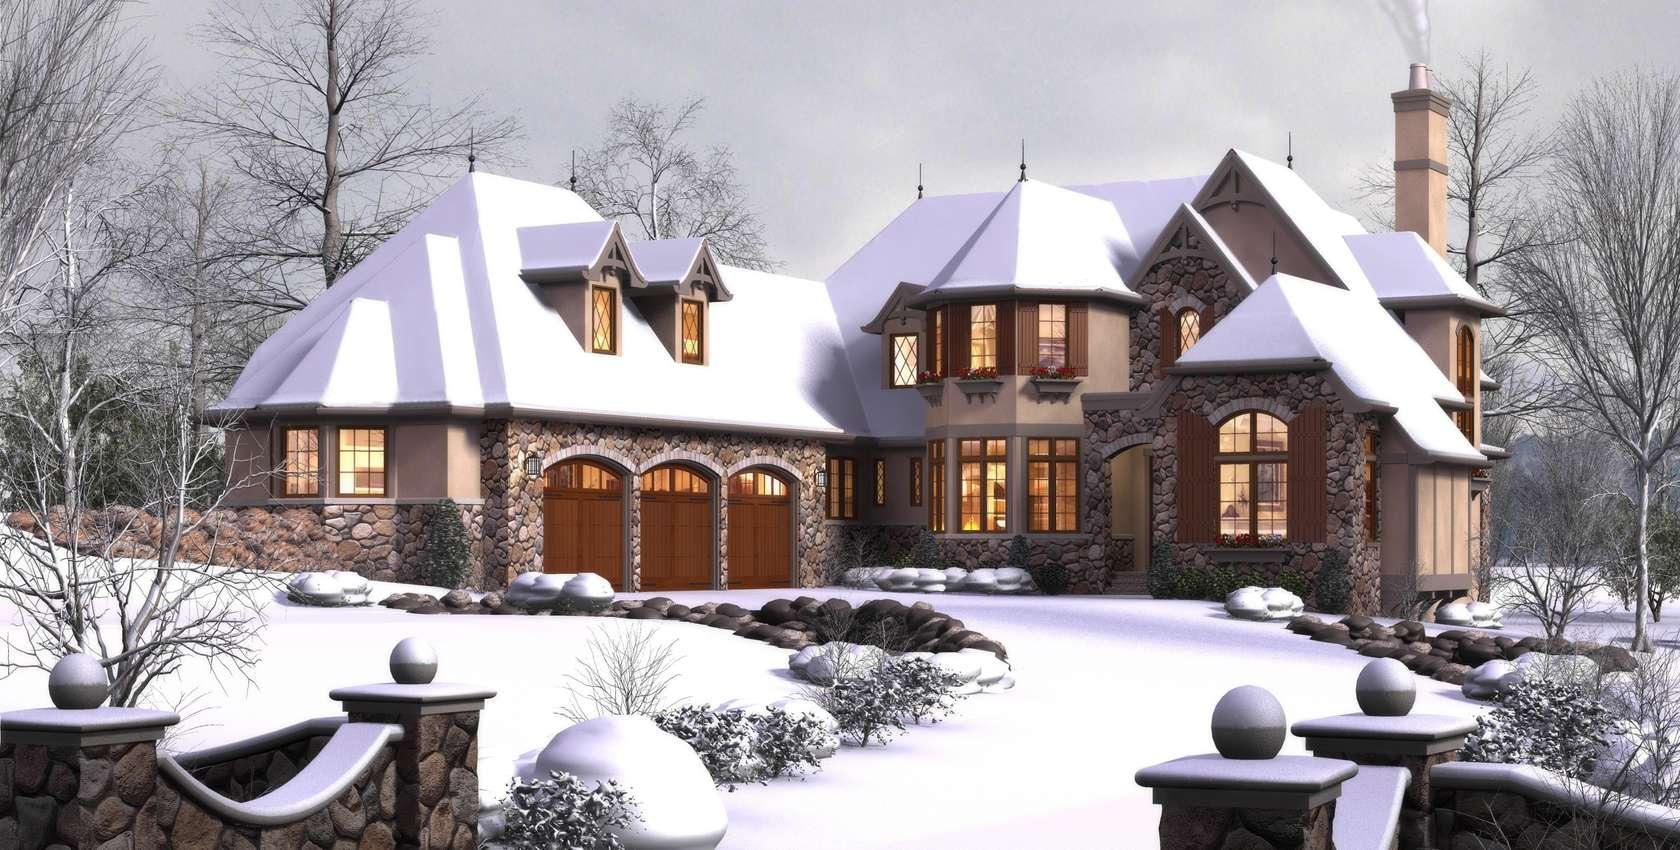 Image for Rivendell Manor-Storybook Splendor in the Street of Dreams-6203